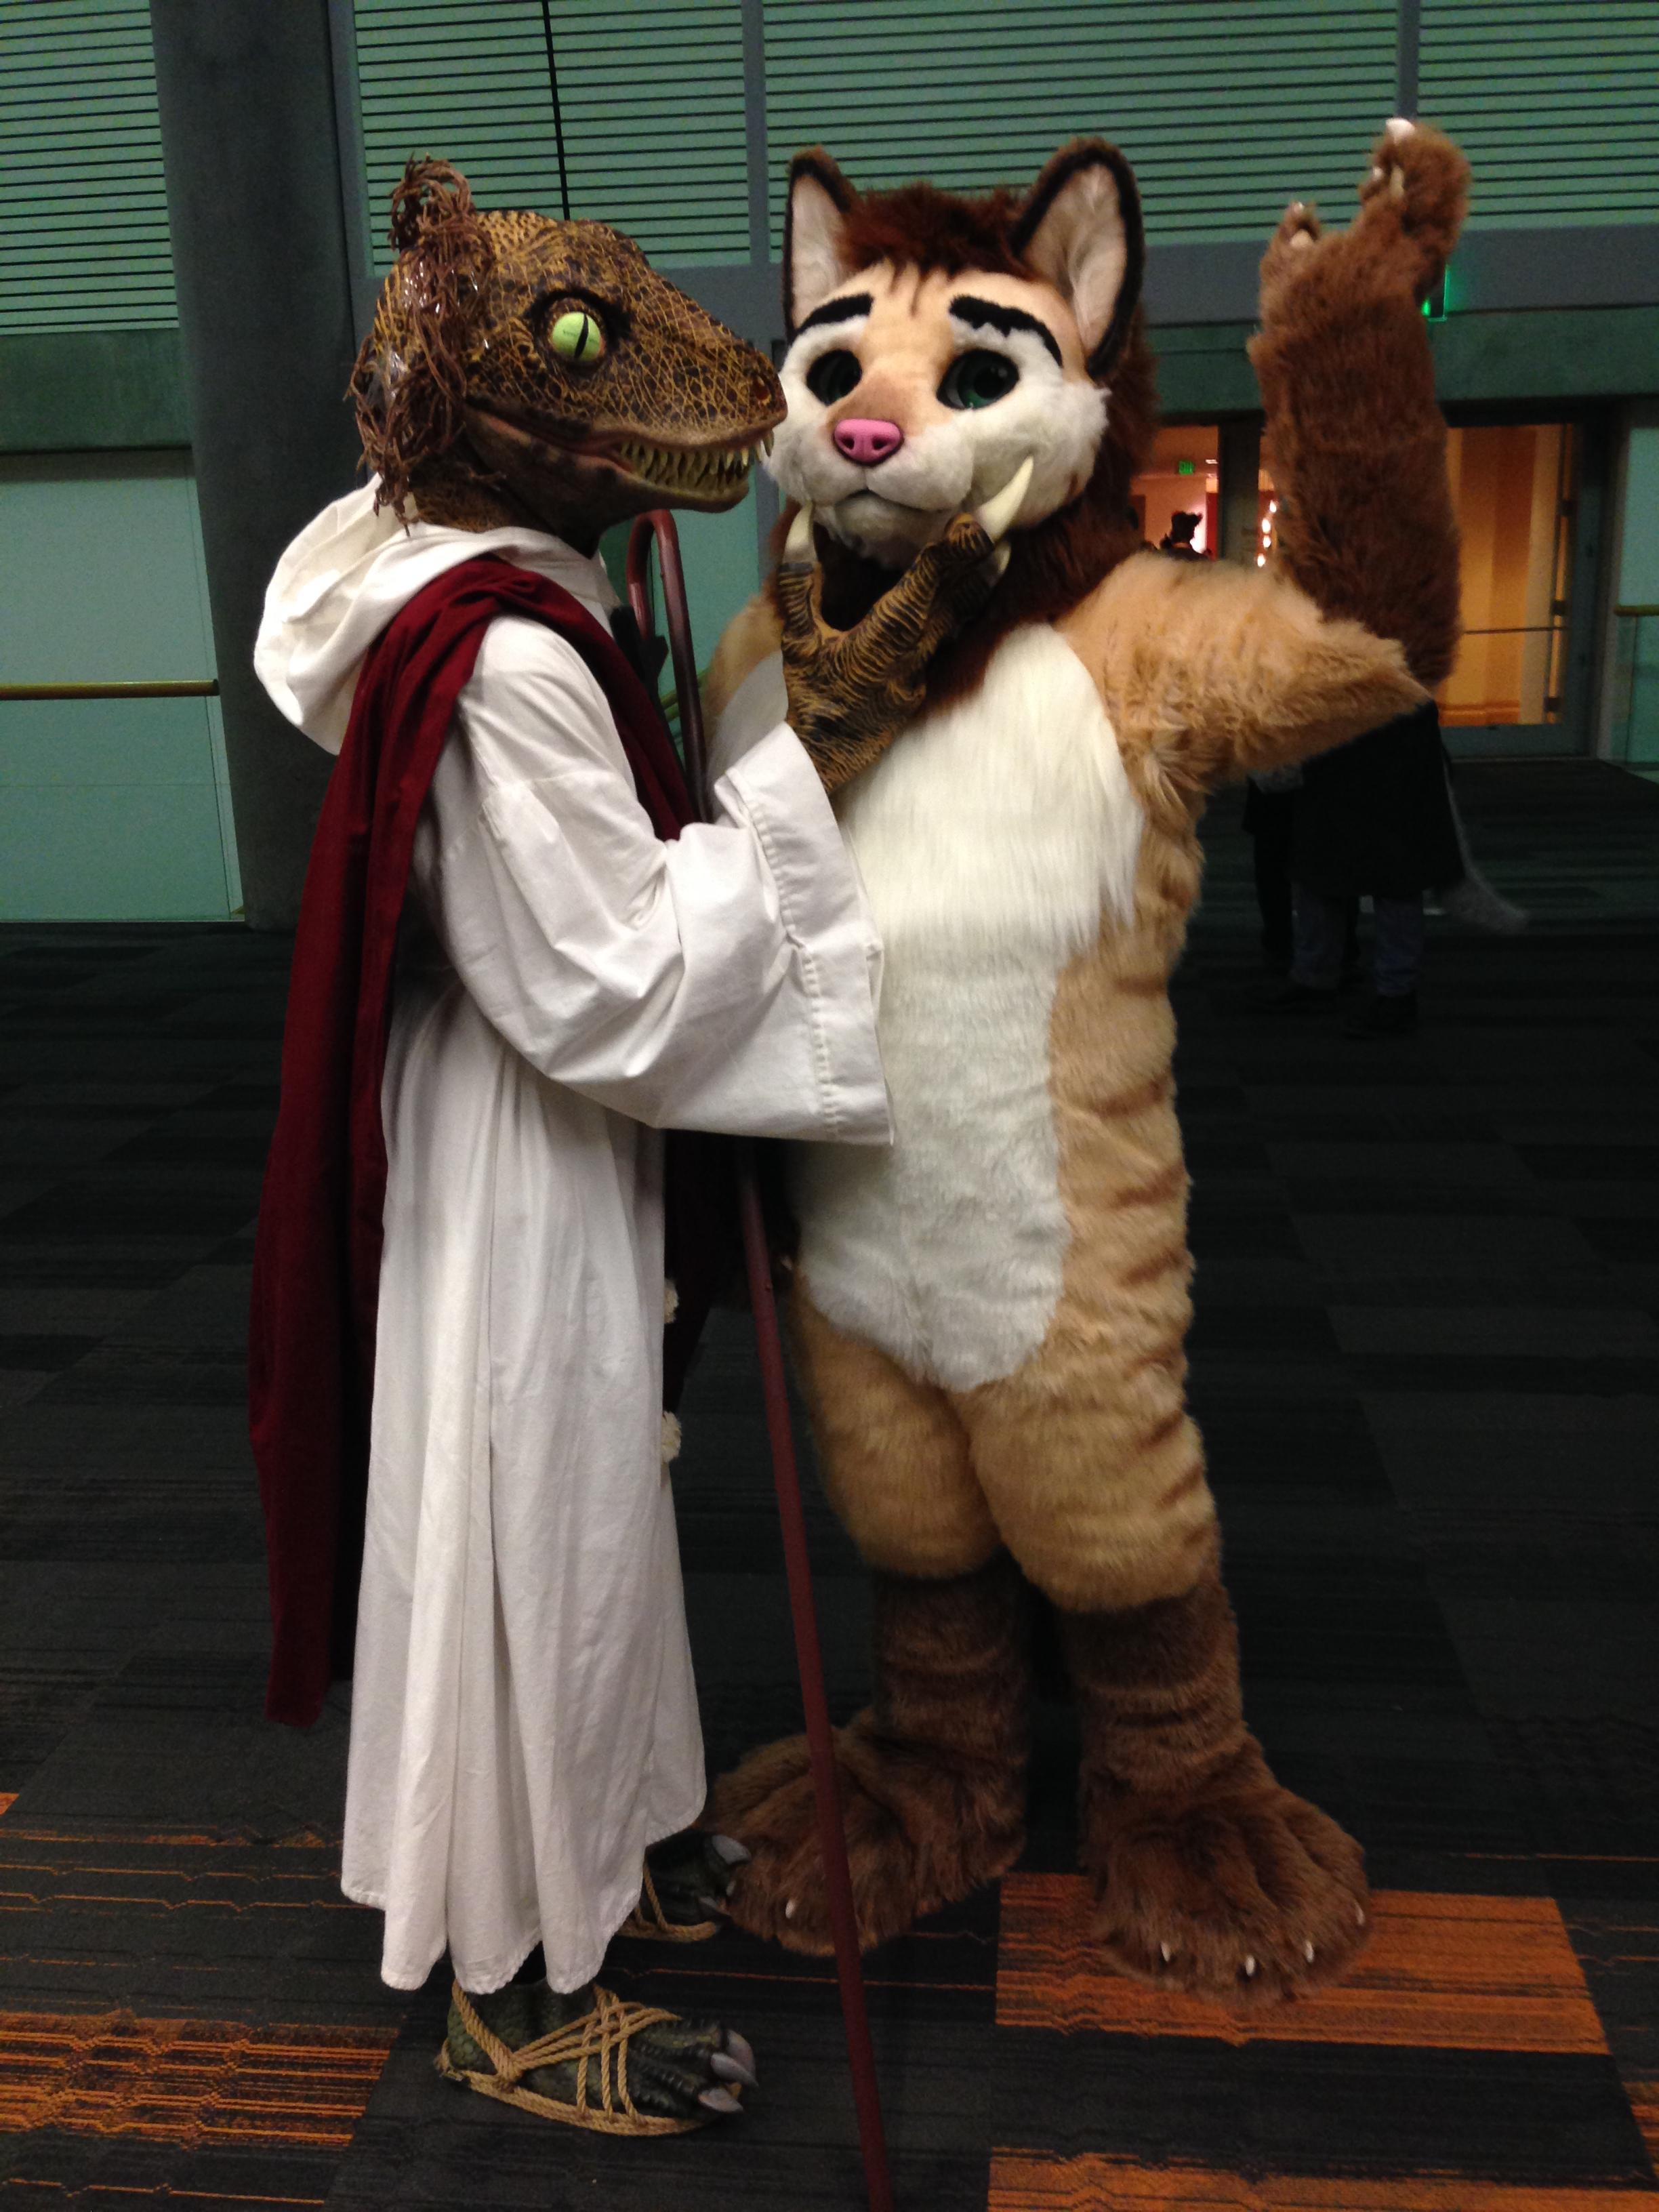 Raptor Jesus Saves (FC2014) & Raptor Jesus Saves (FC2014) u2014 Weasyl